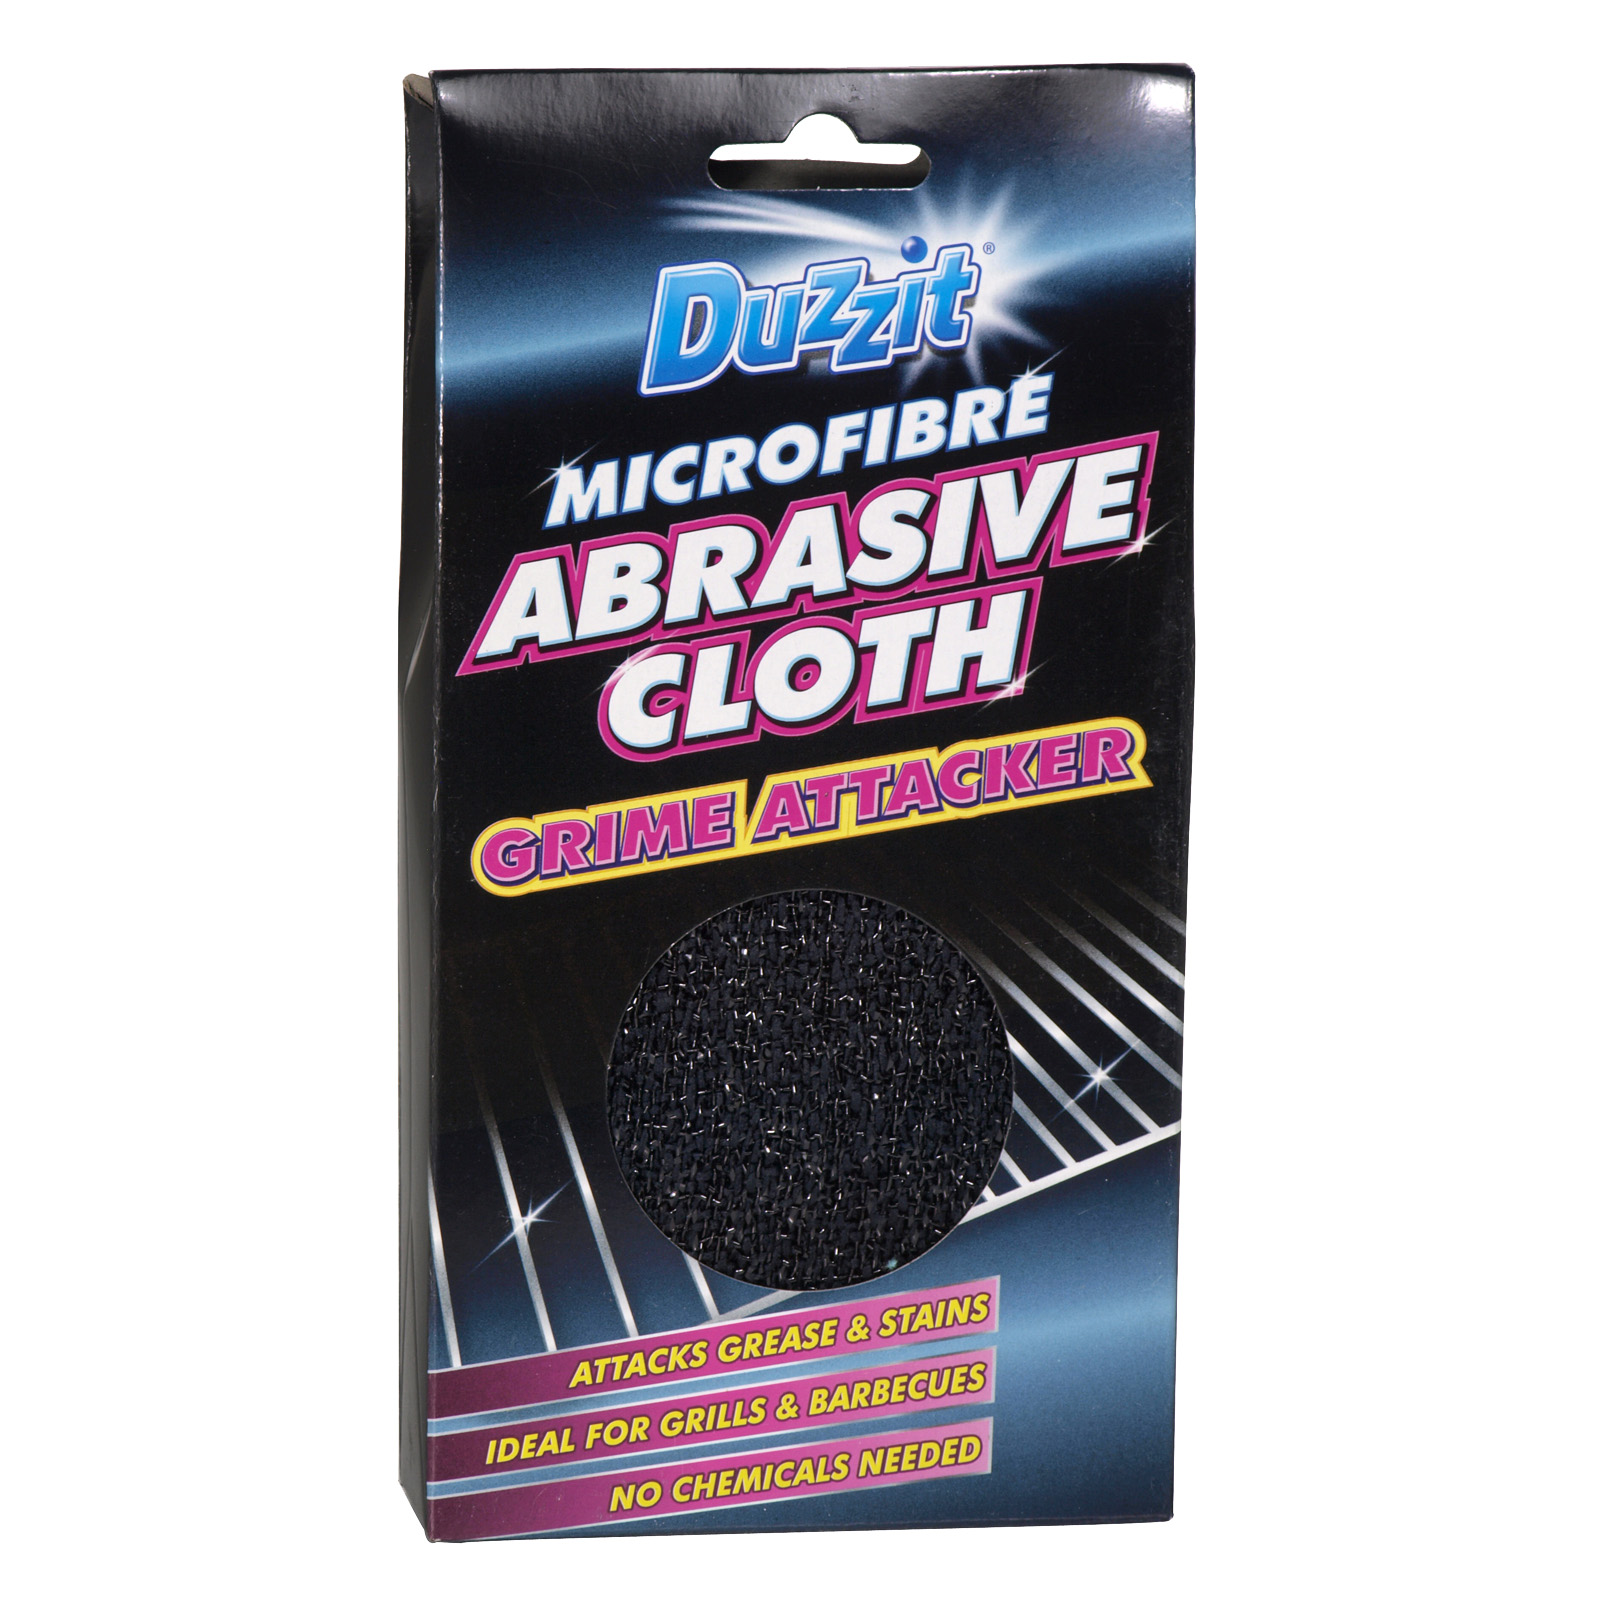 DUZZIT MICROBIBRE ABRASIVE CLOTH X24